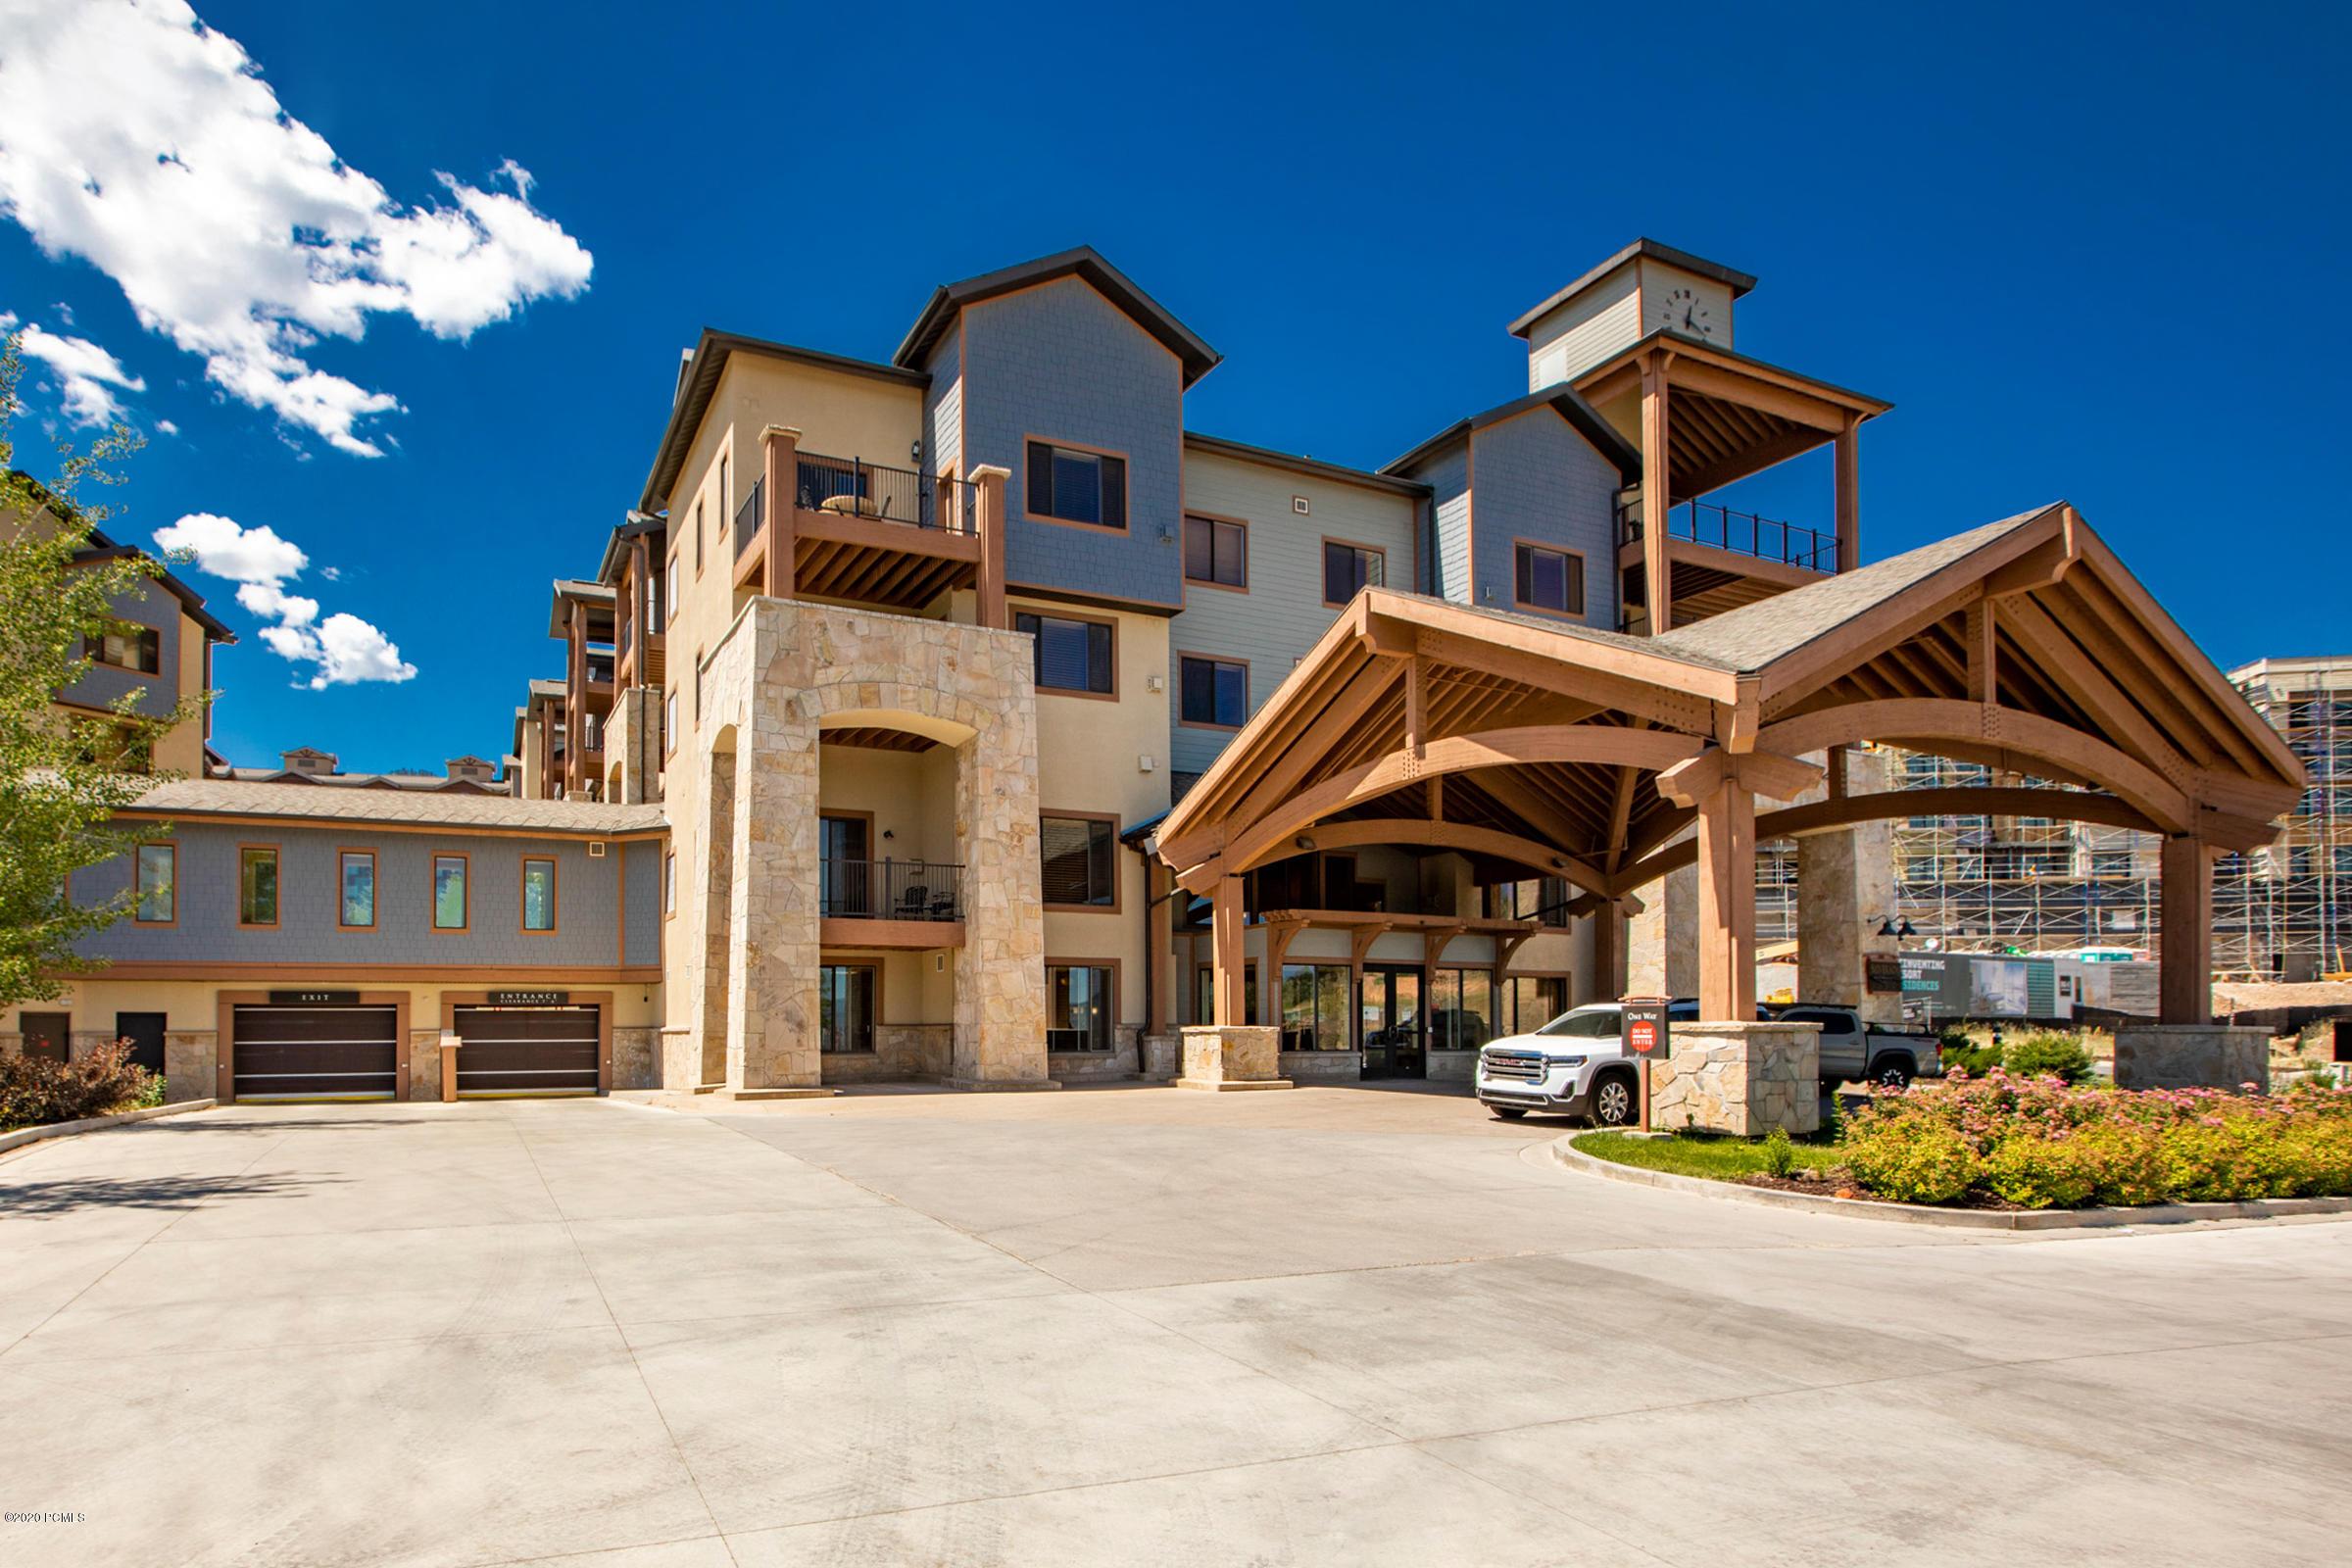 2653 Canyons Resort Drive, Park City, Utah 84098, 3 Bedrooms Bedrooms, ,4 BathroomsBathrooms,Condominium,For Sale,Canyons Resort,12002812